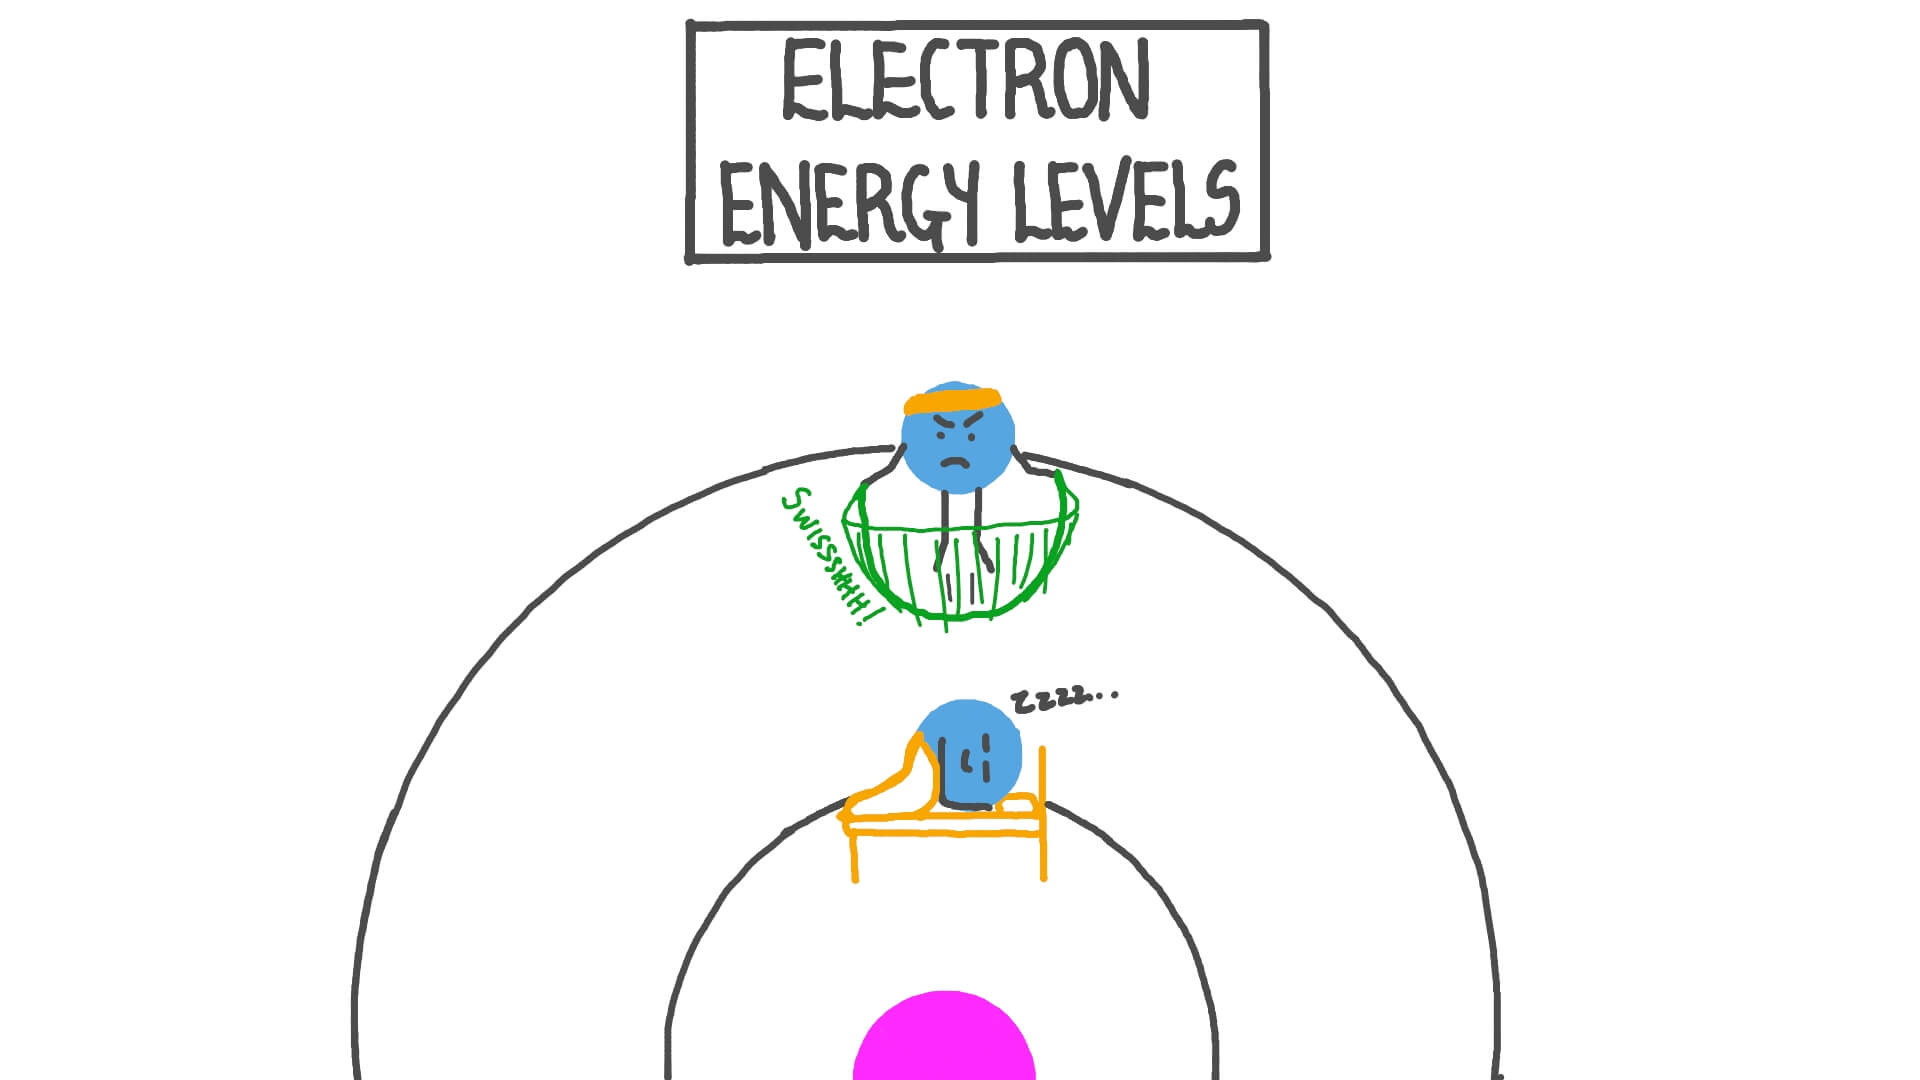 Video: Electron Energy Levels | Nagwa